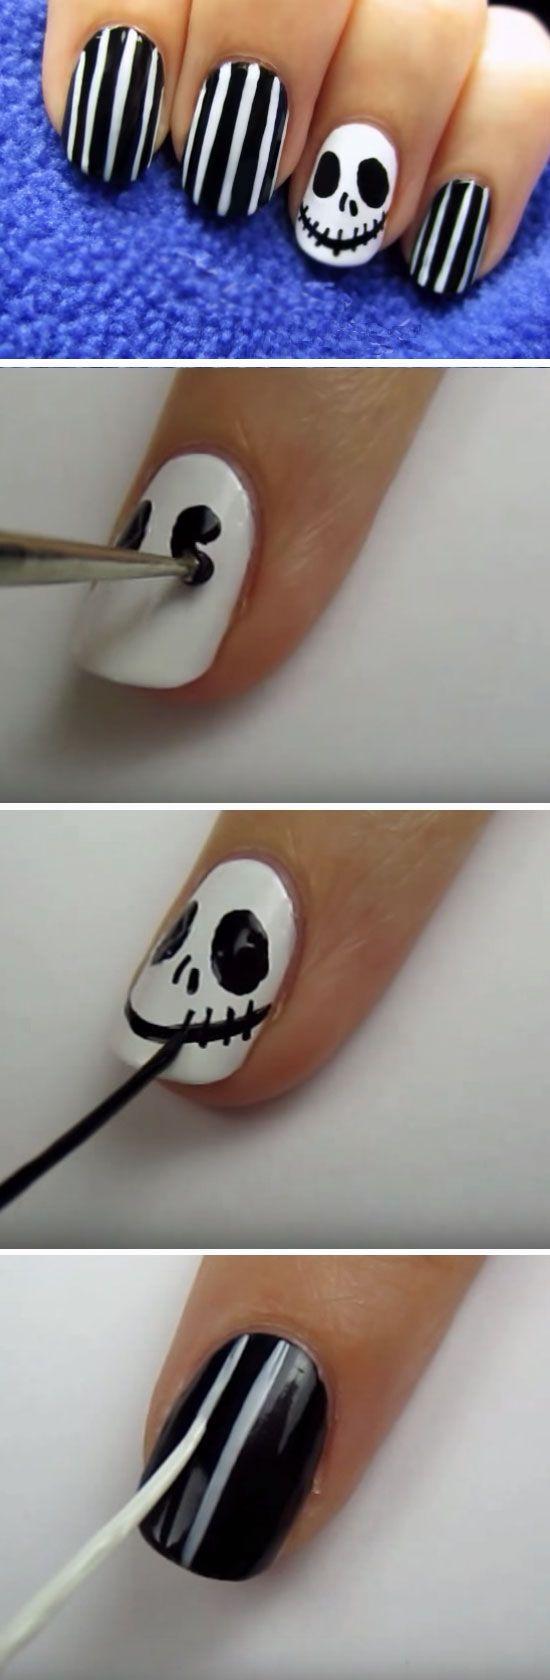 spooky nail art ideas for halloween holloween pinterest